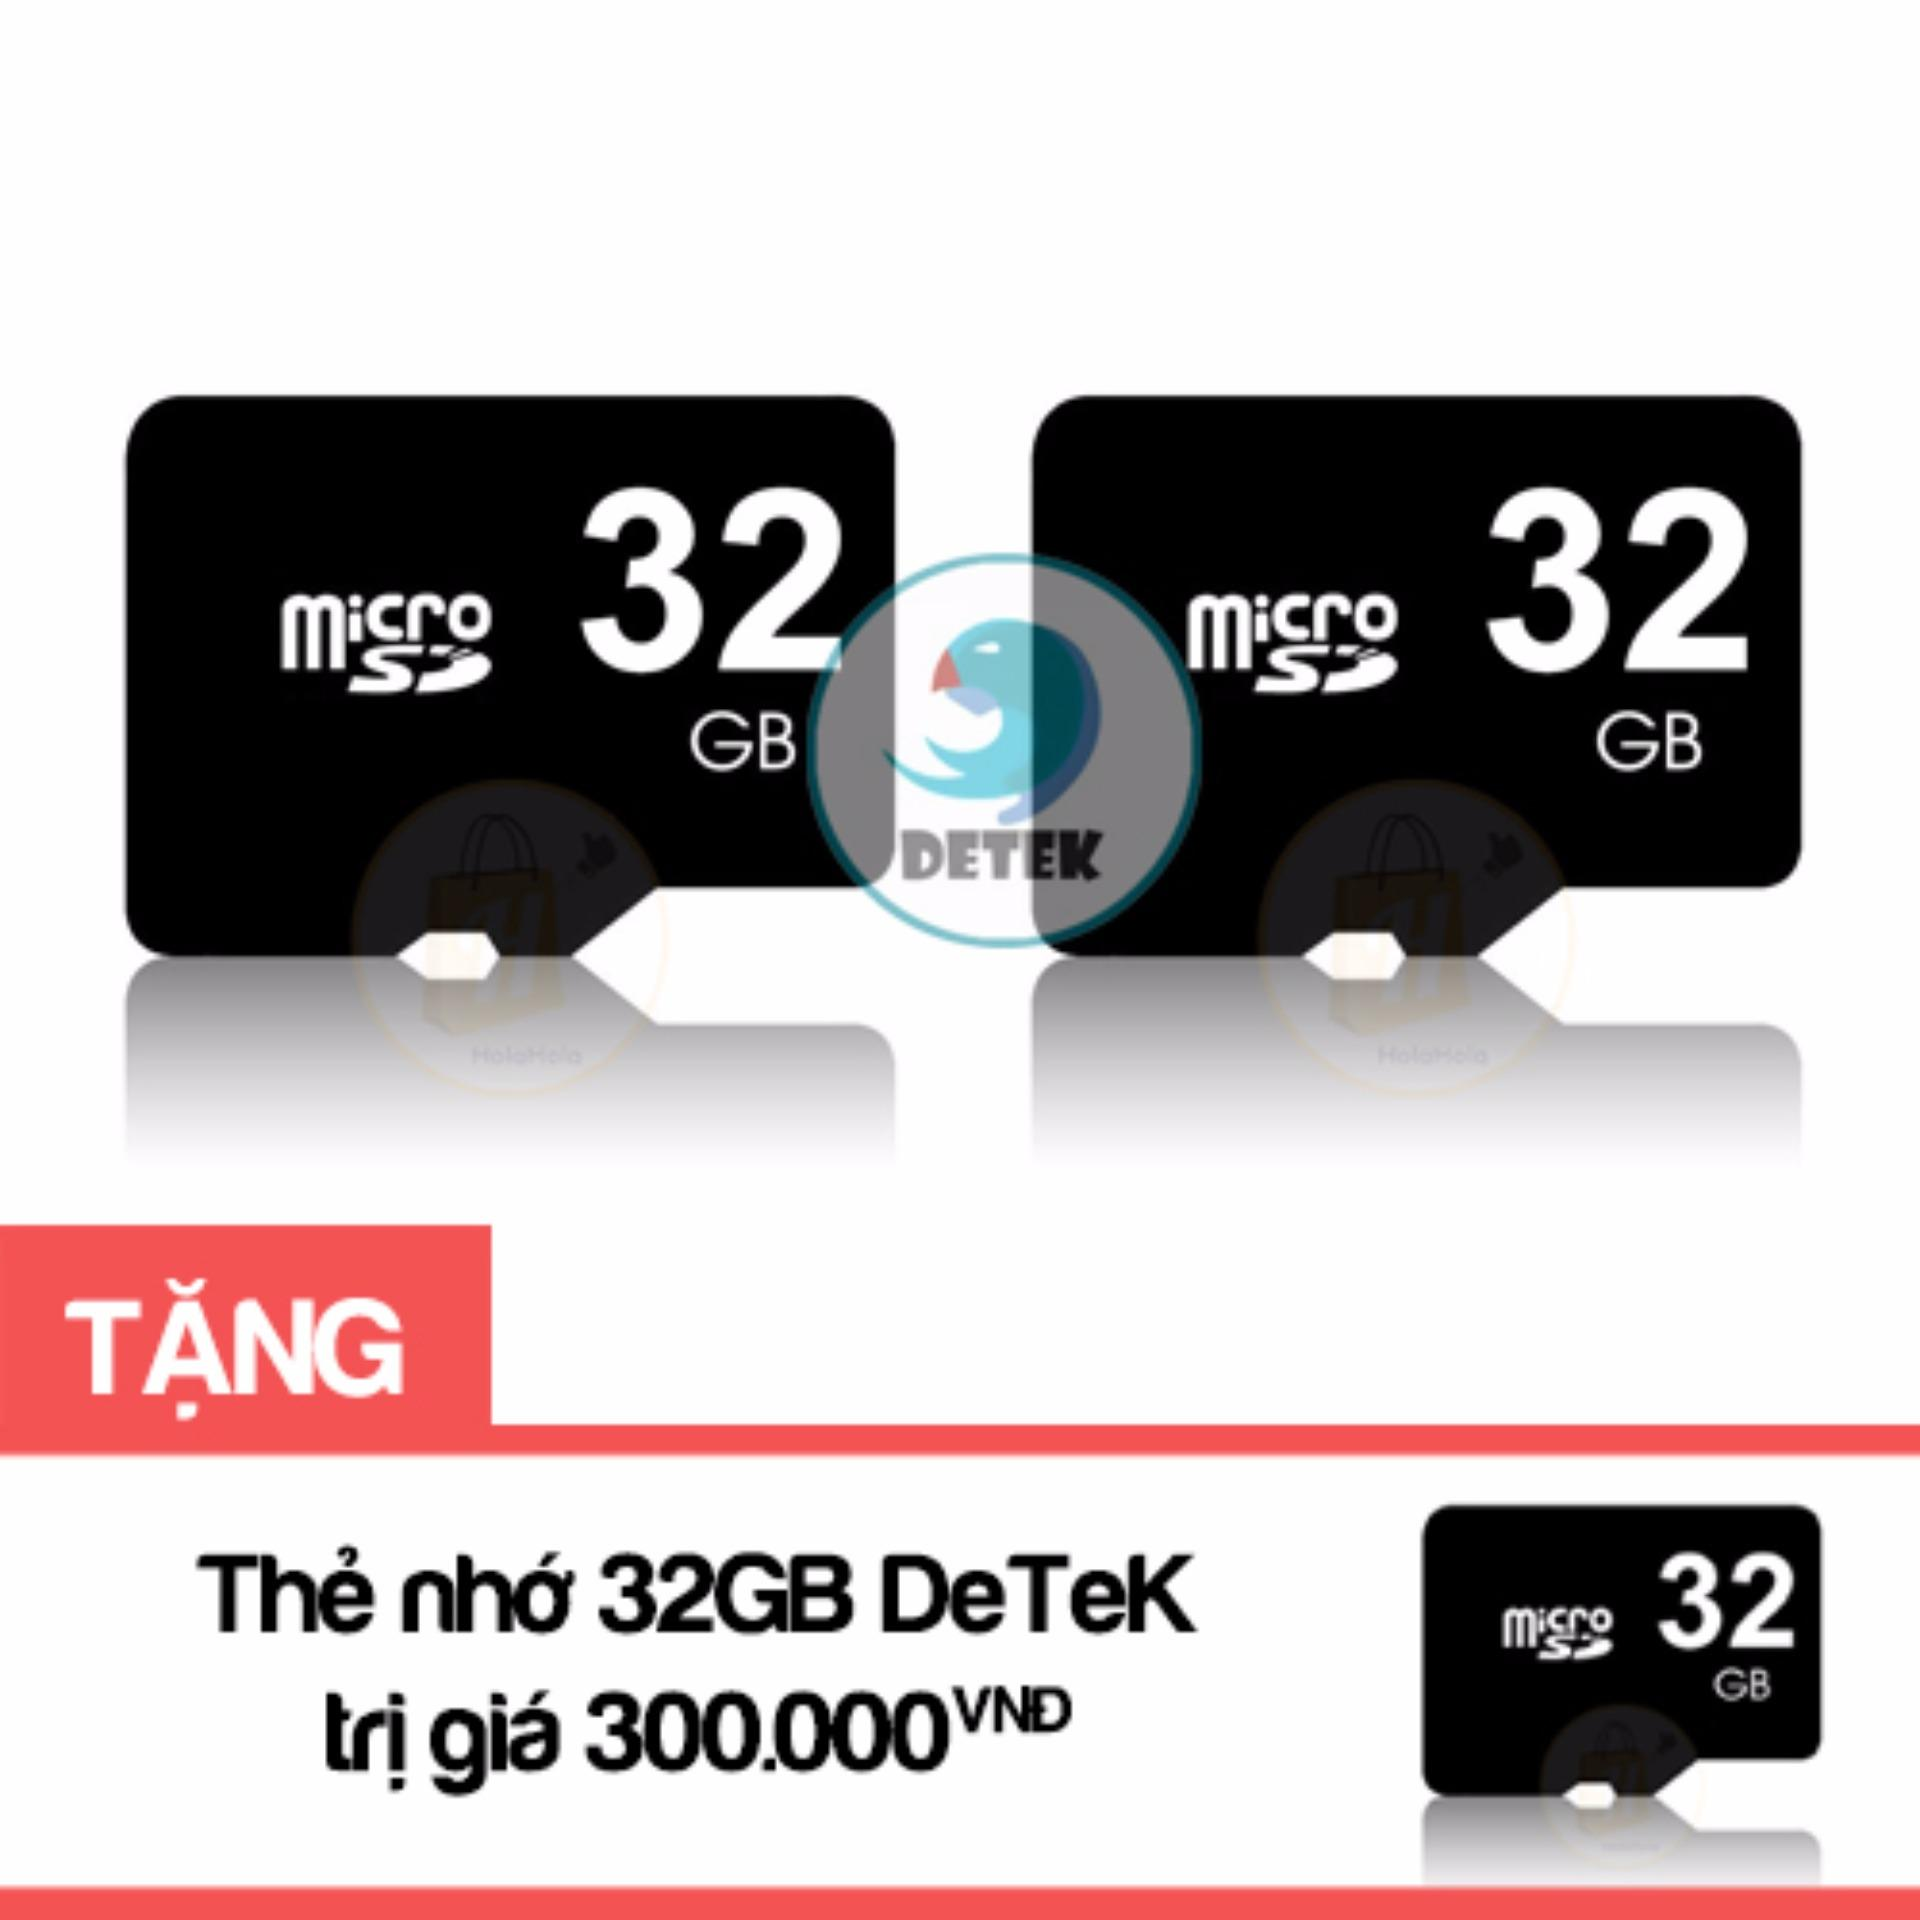 Bộ 2 Thẻ Nhớ Microsd 32Gb Detek